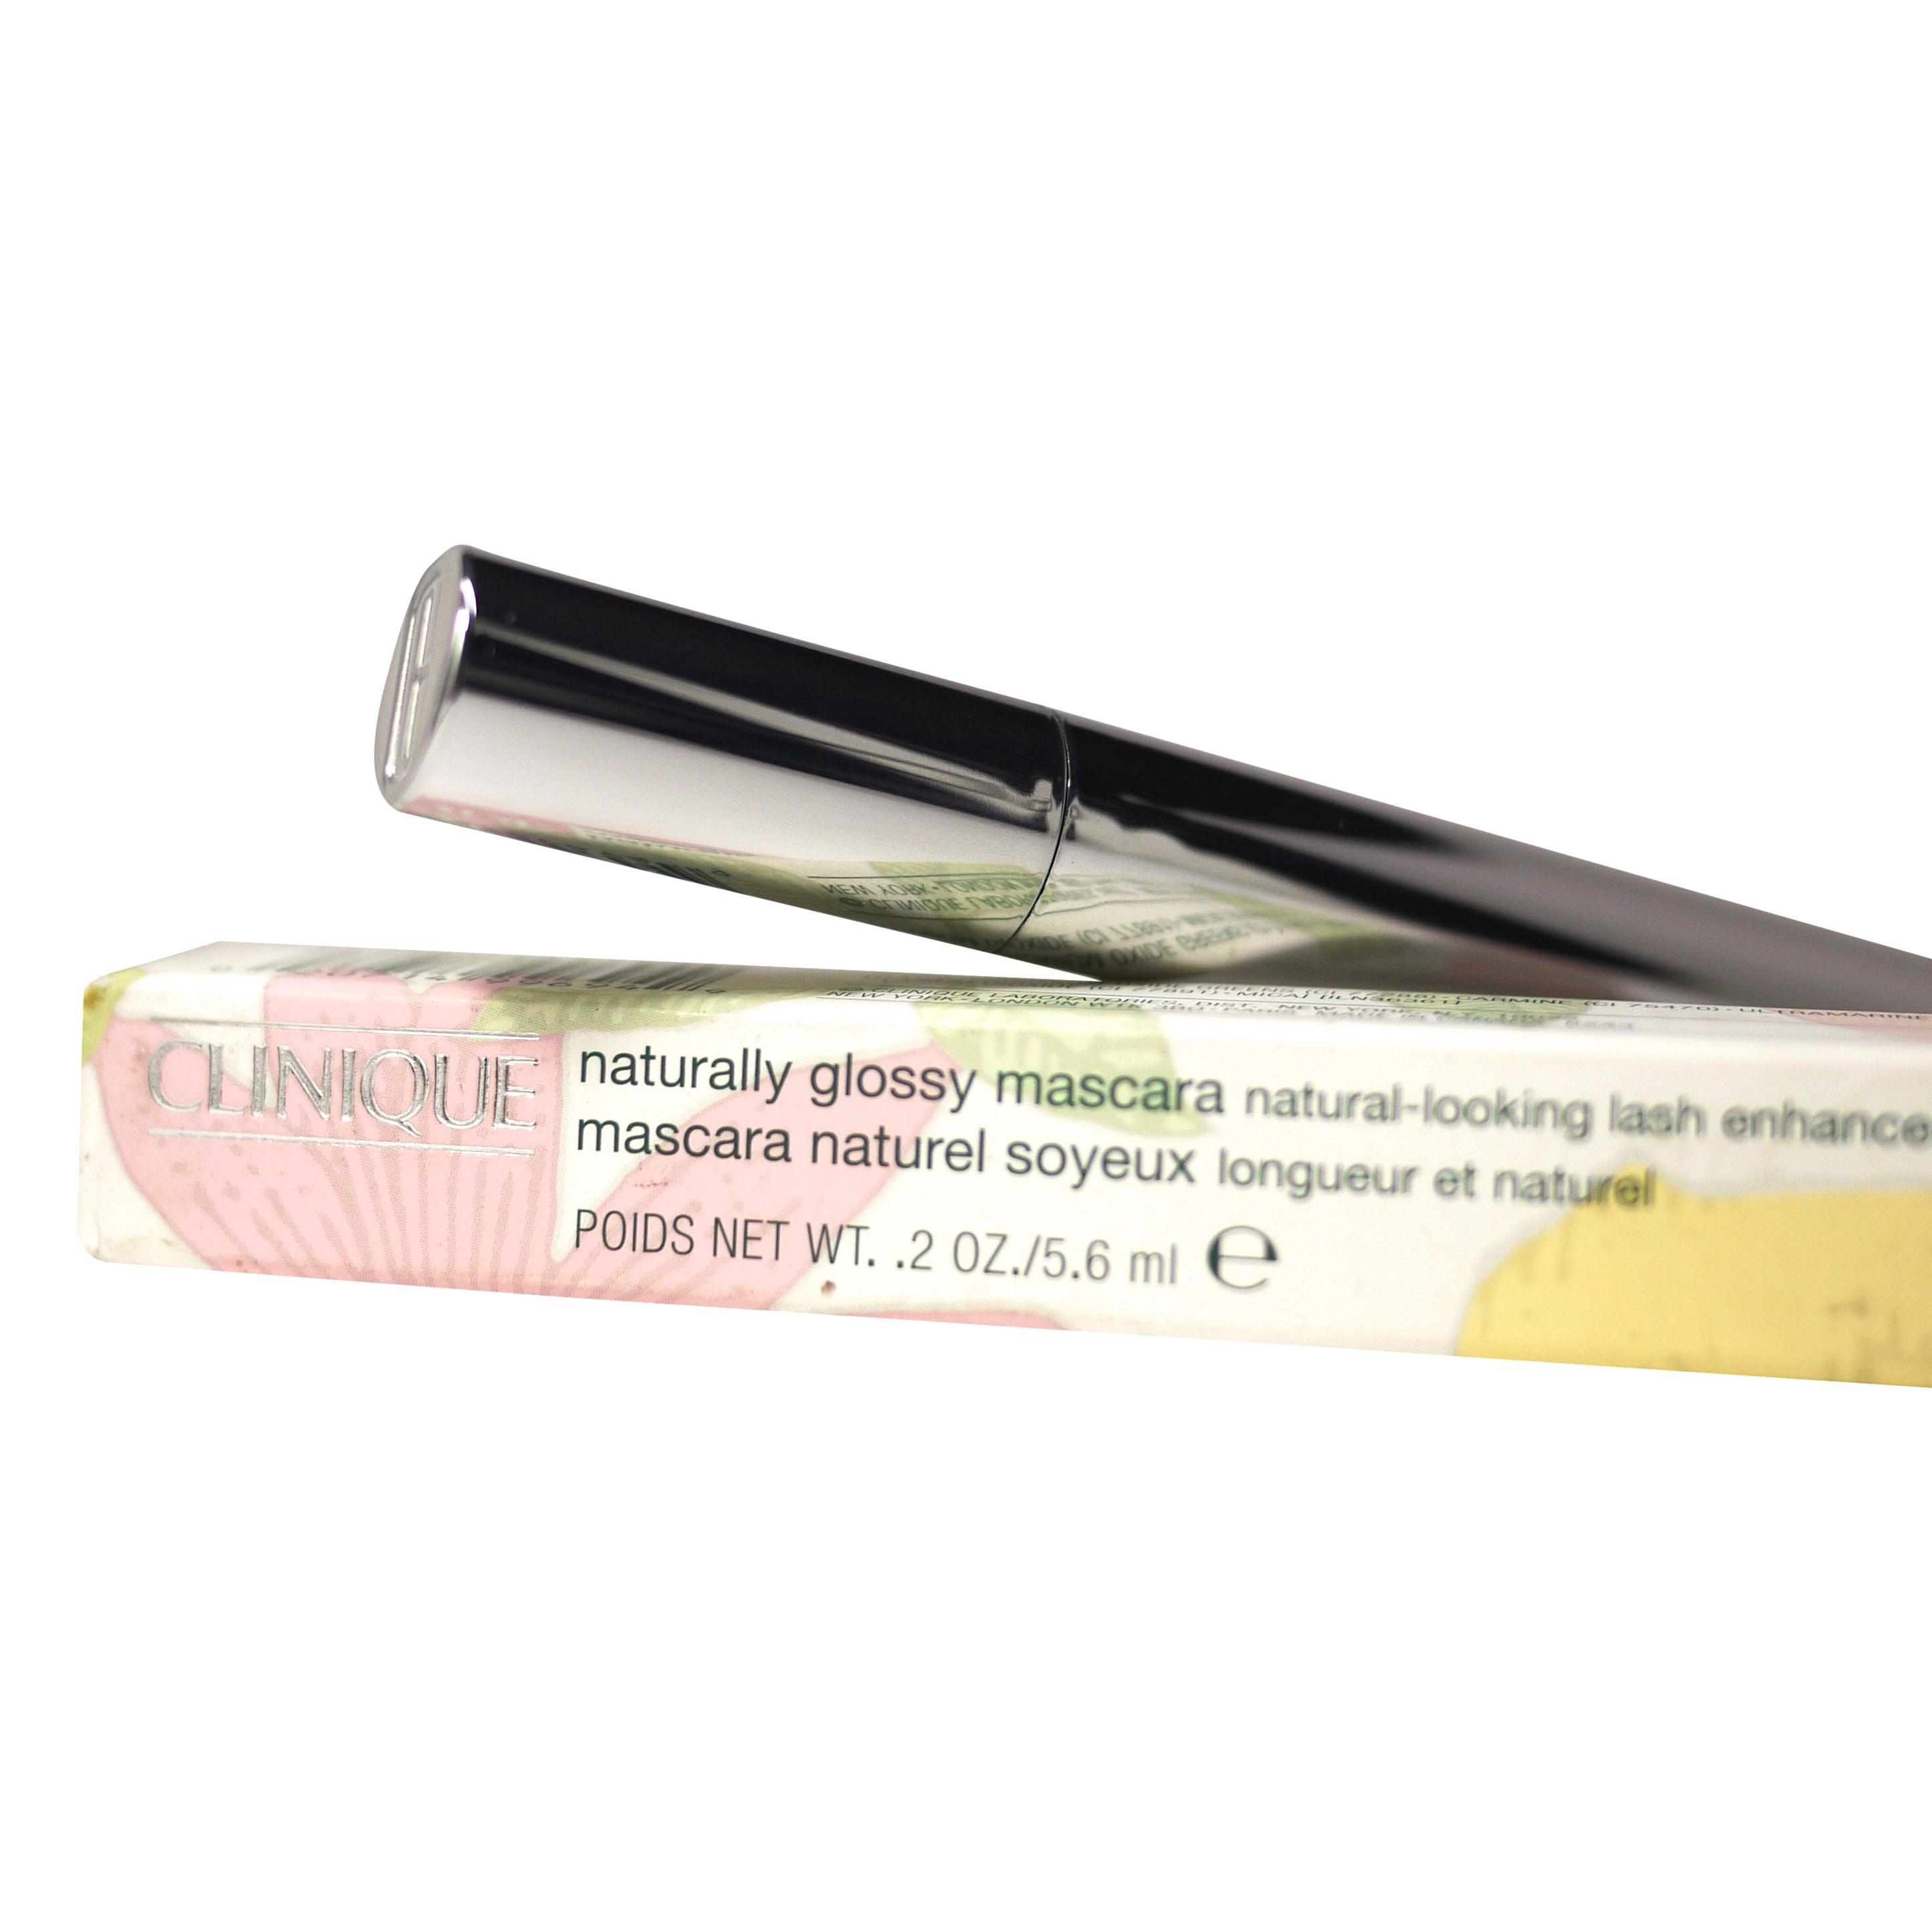 dbd6d58de39 Clinique Naturally Glossy Mascara Jet Brown 02   Glambot.com - Best deals  on Clinique cosmetics